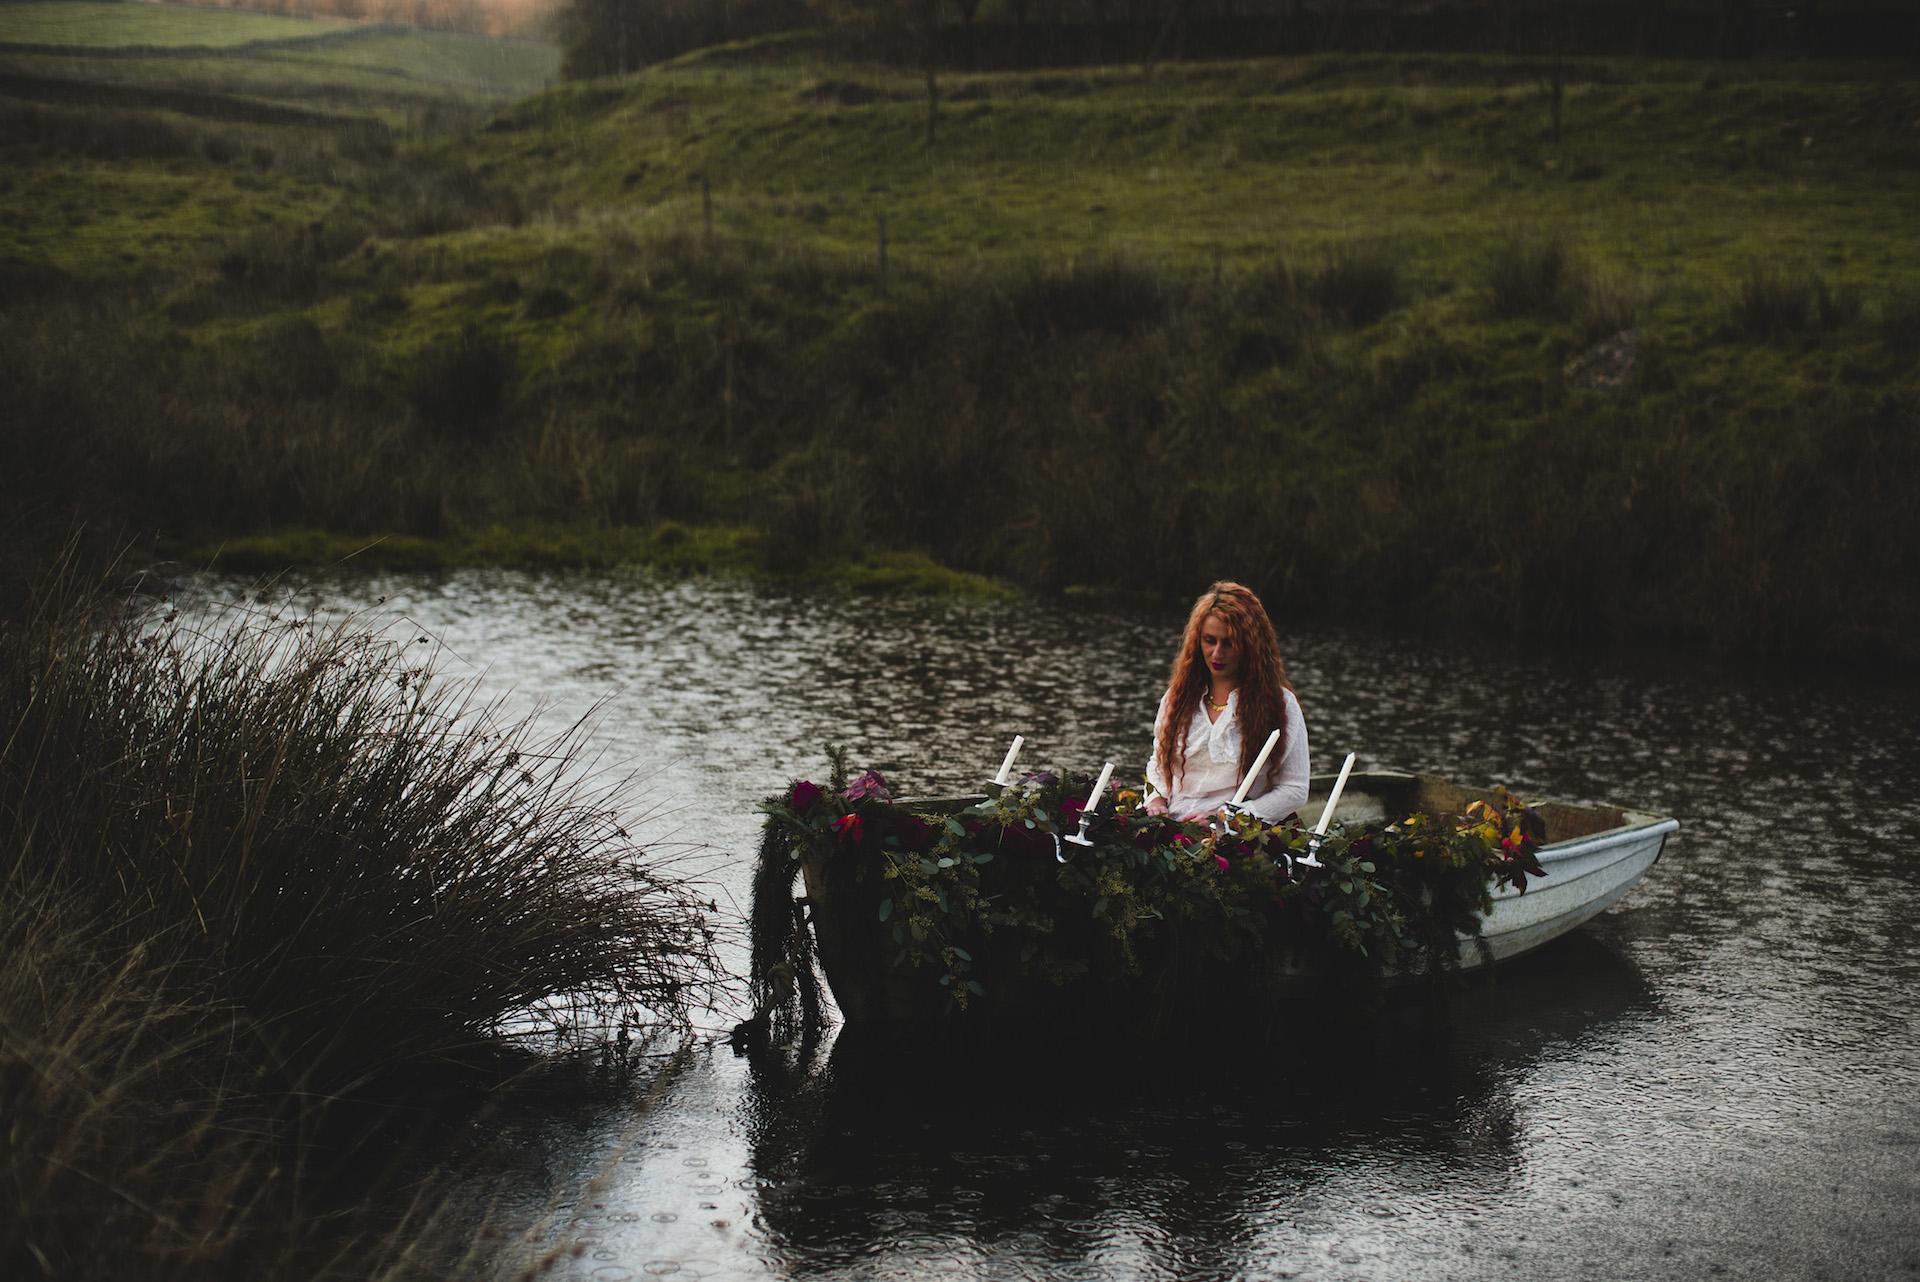 Lady of Shalott - Rain